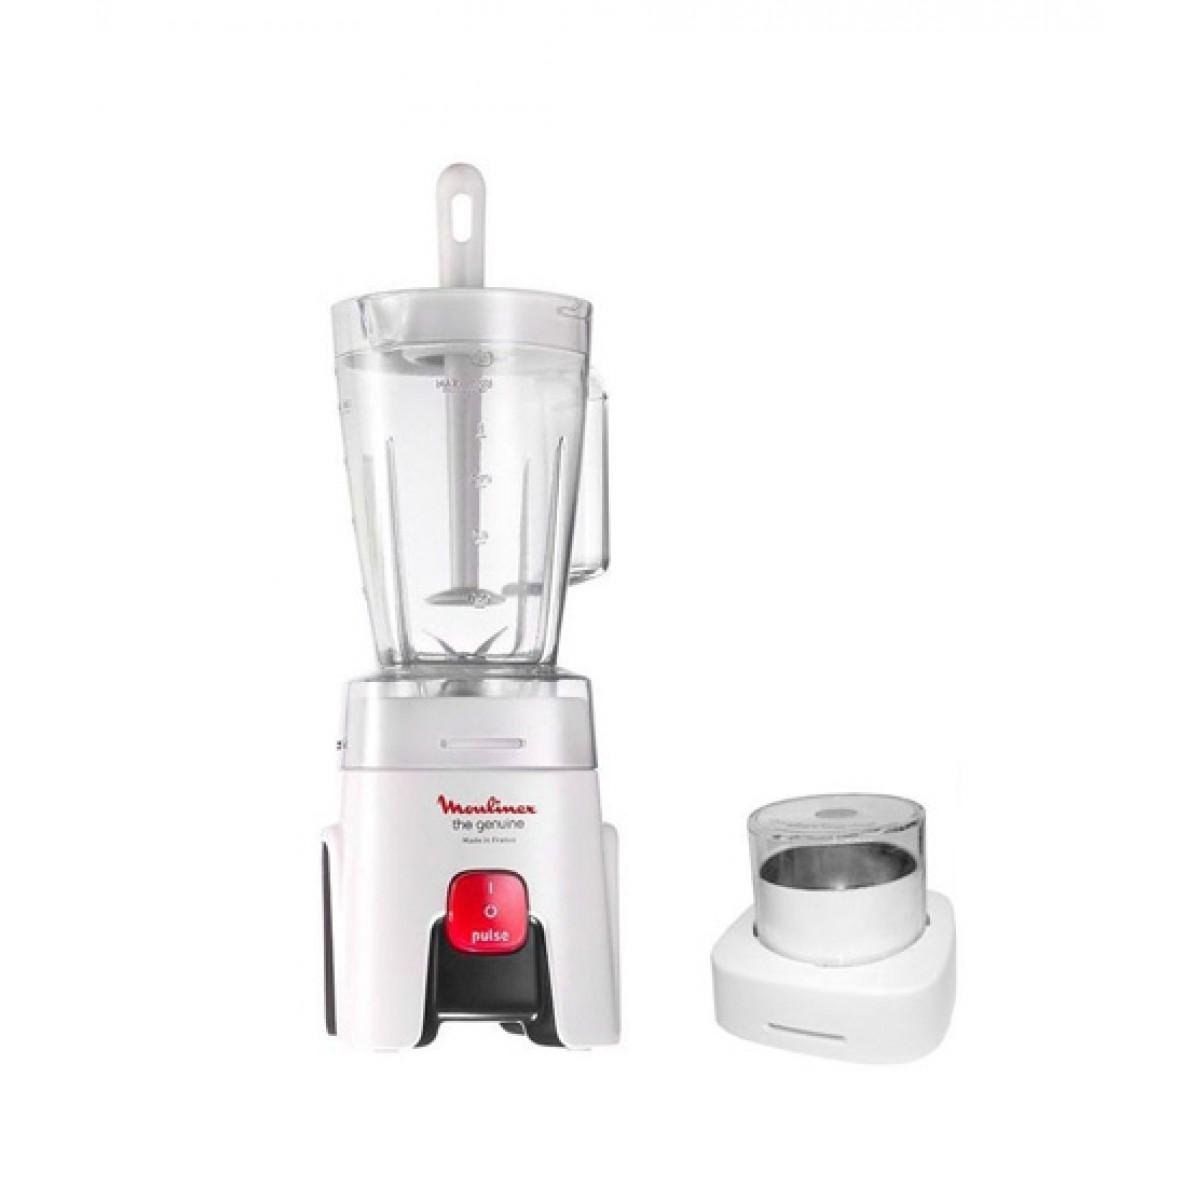 Moulinex Lm241025 Juicer Blender Price In Pakistan Homeshopping